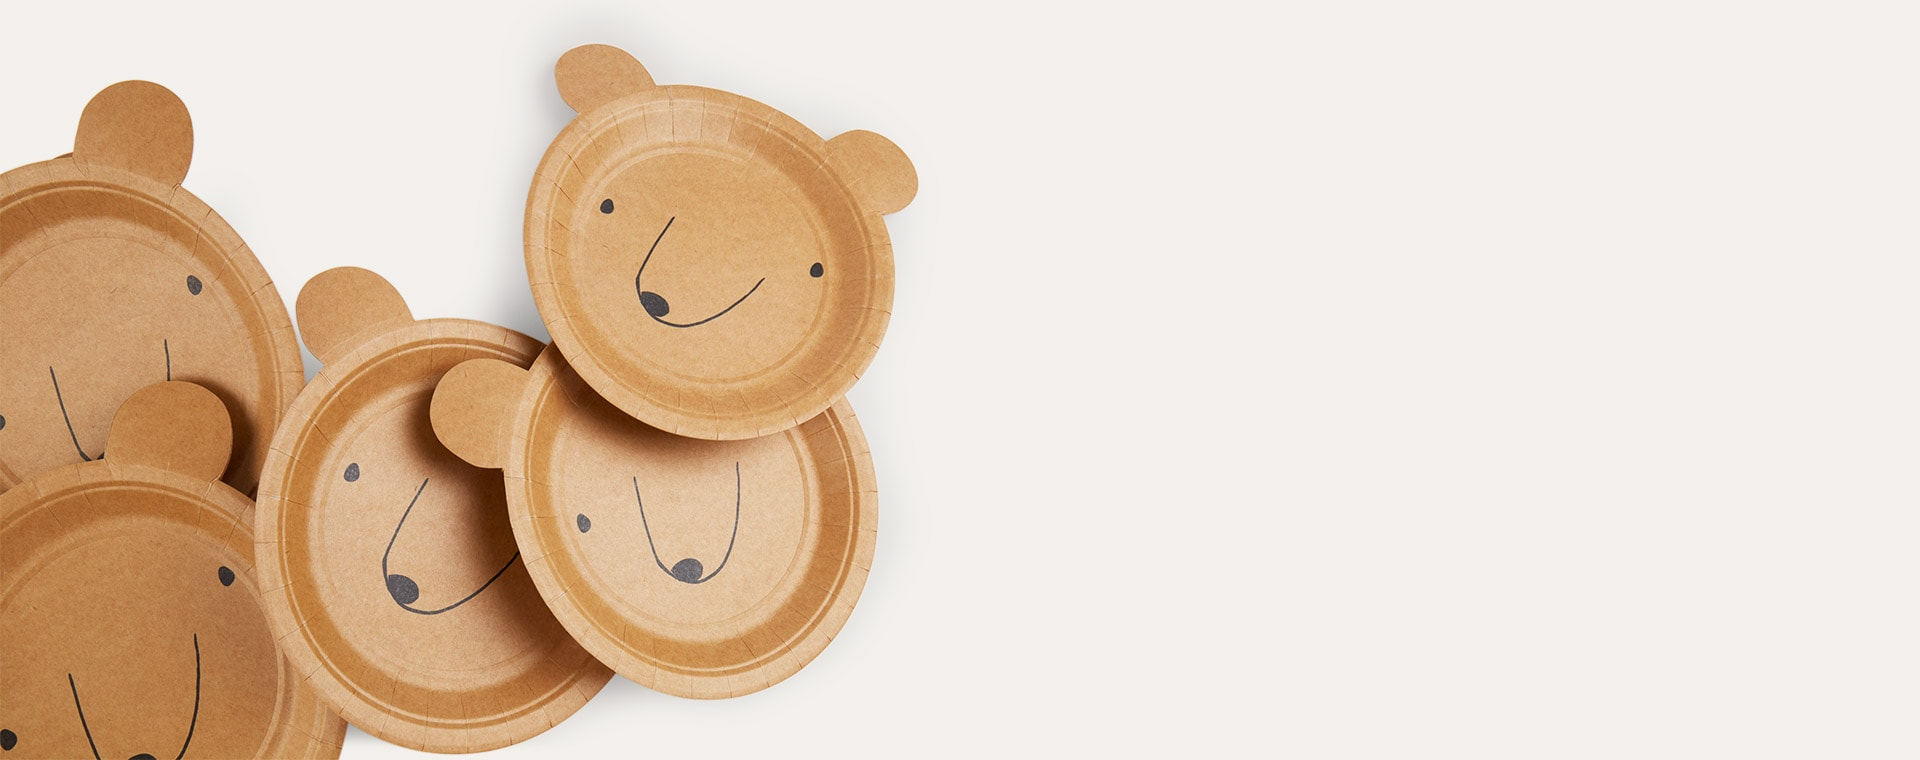 Neutral Meri Meri Small Bear Plates - 12 Pack